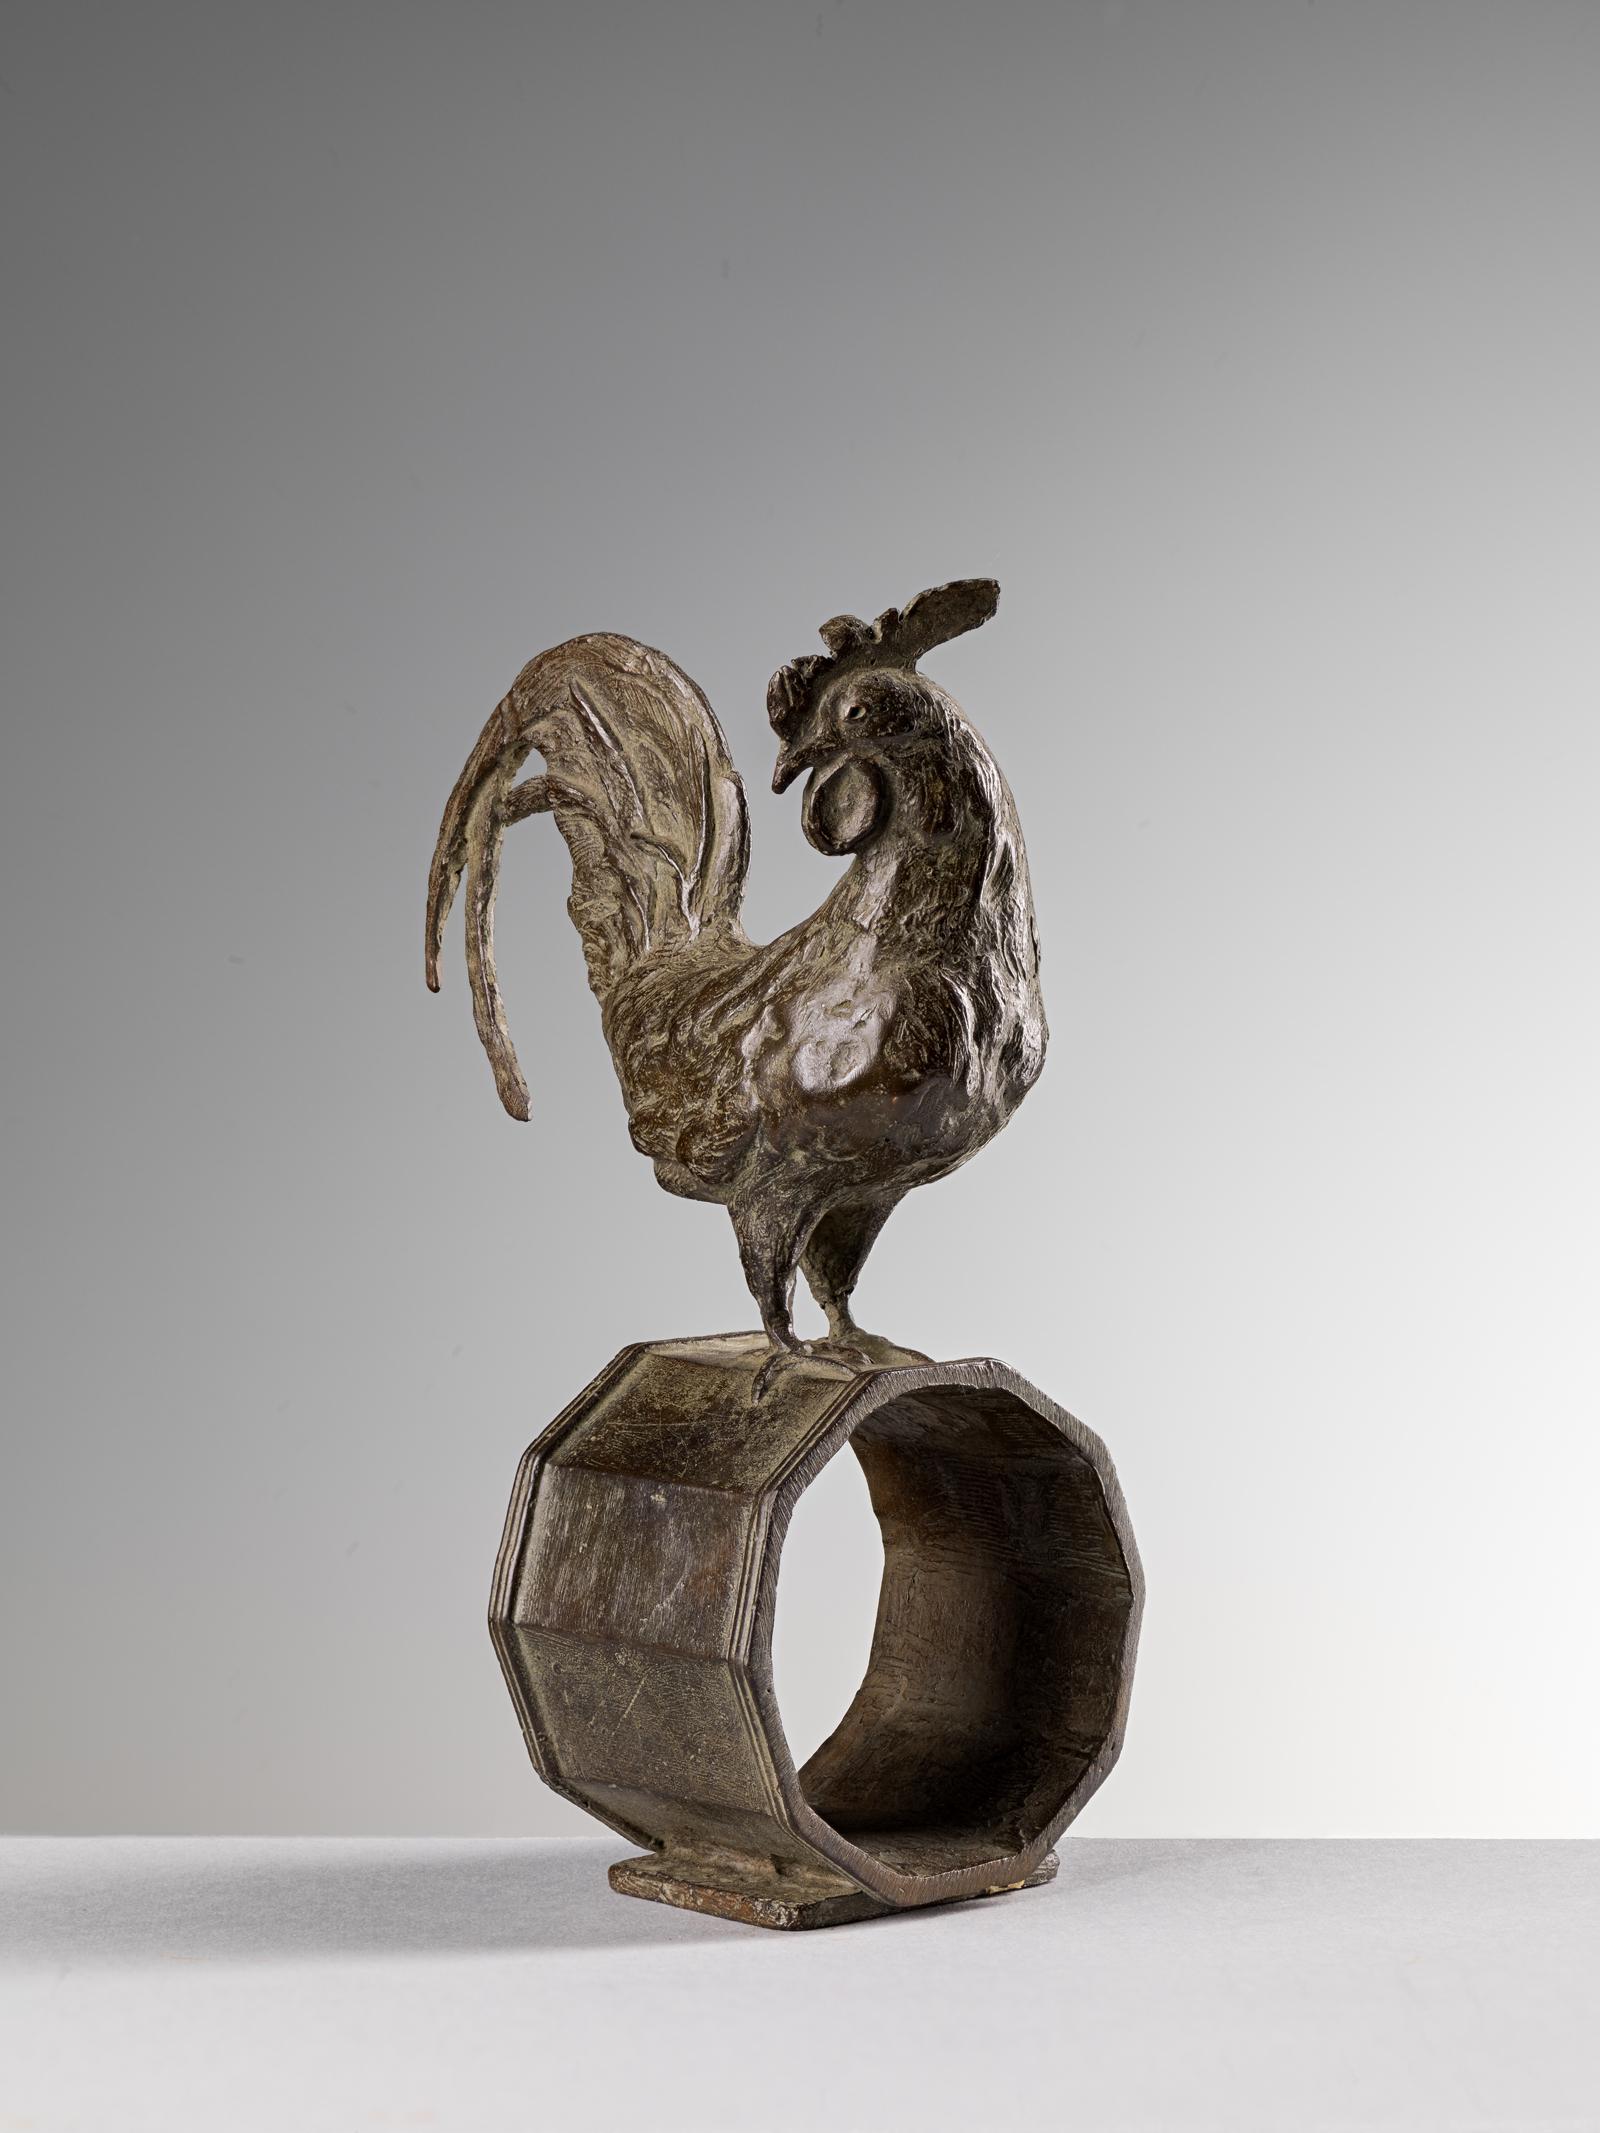 16. Cockerel Napkin Ring, 'Gallo' by Nicola Lazzari 12cm H x 9cm W x 5cm D, .jpg